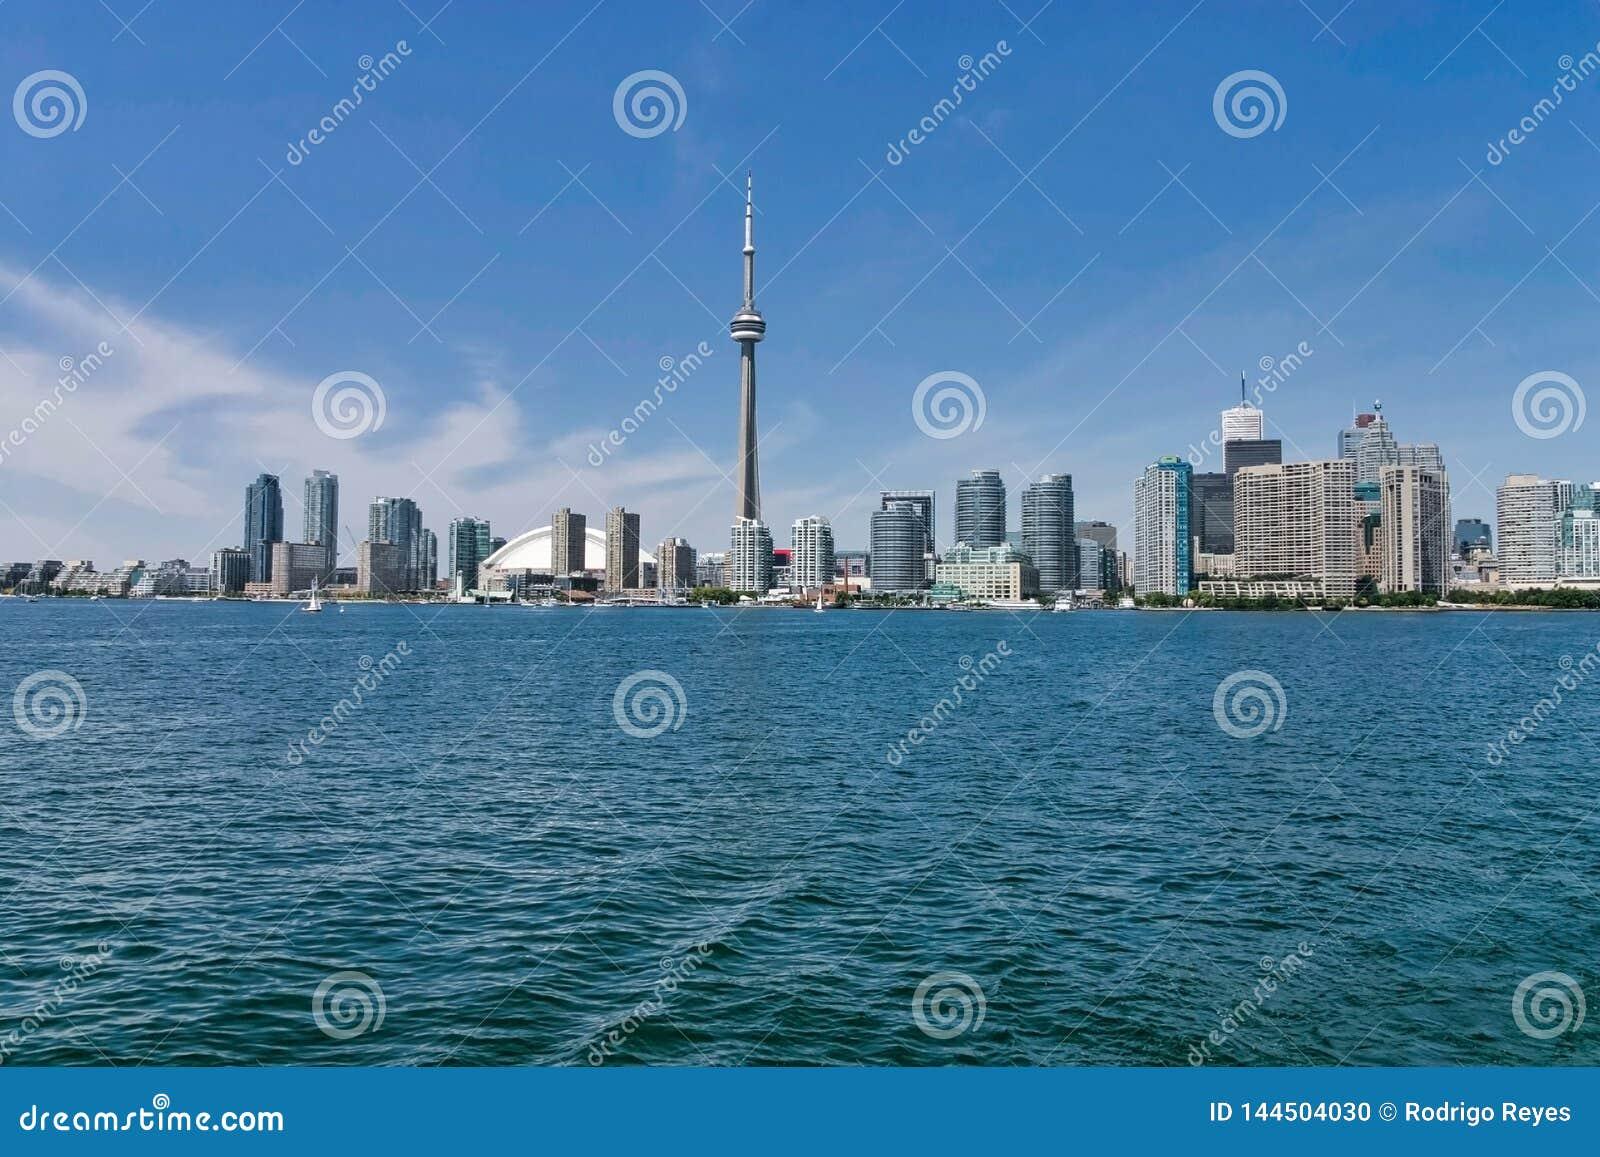 Toronto City and CN Tower